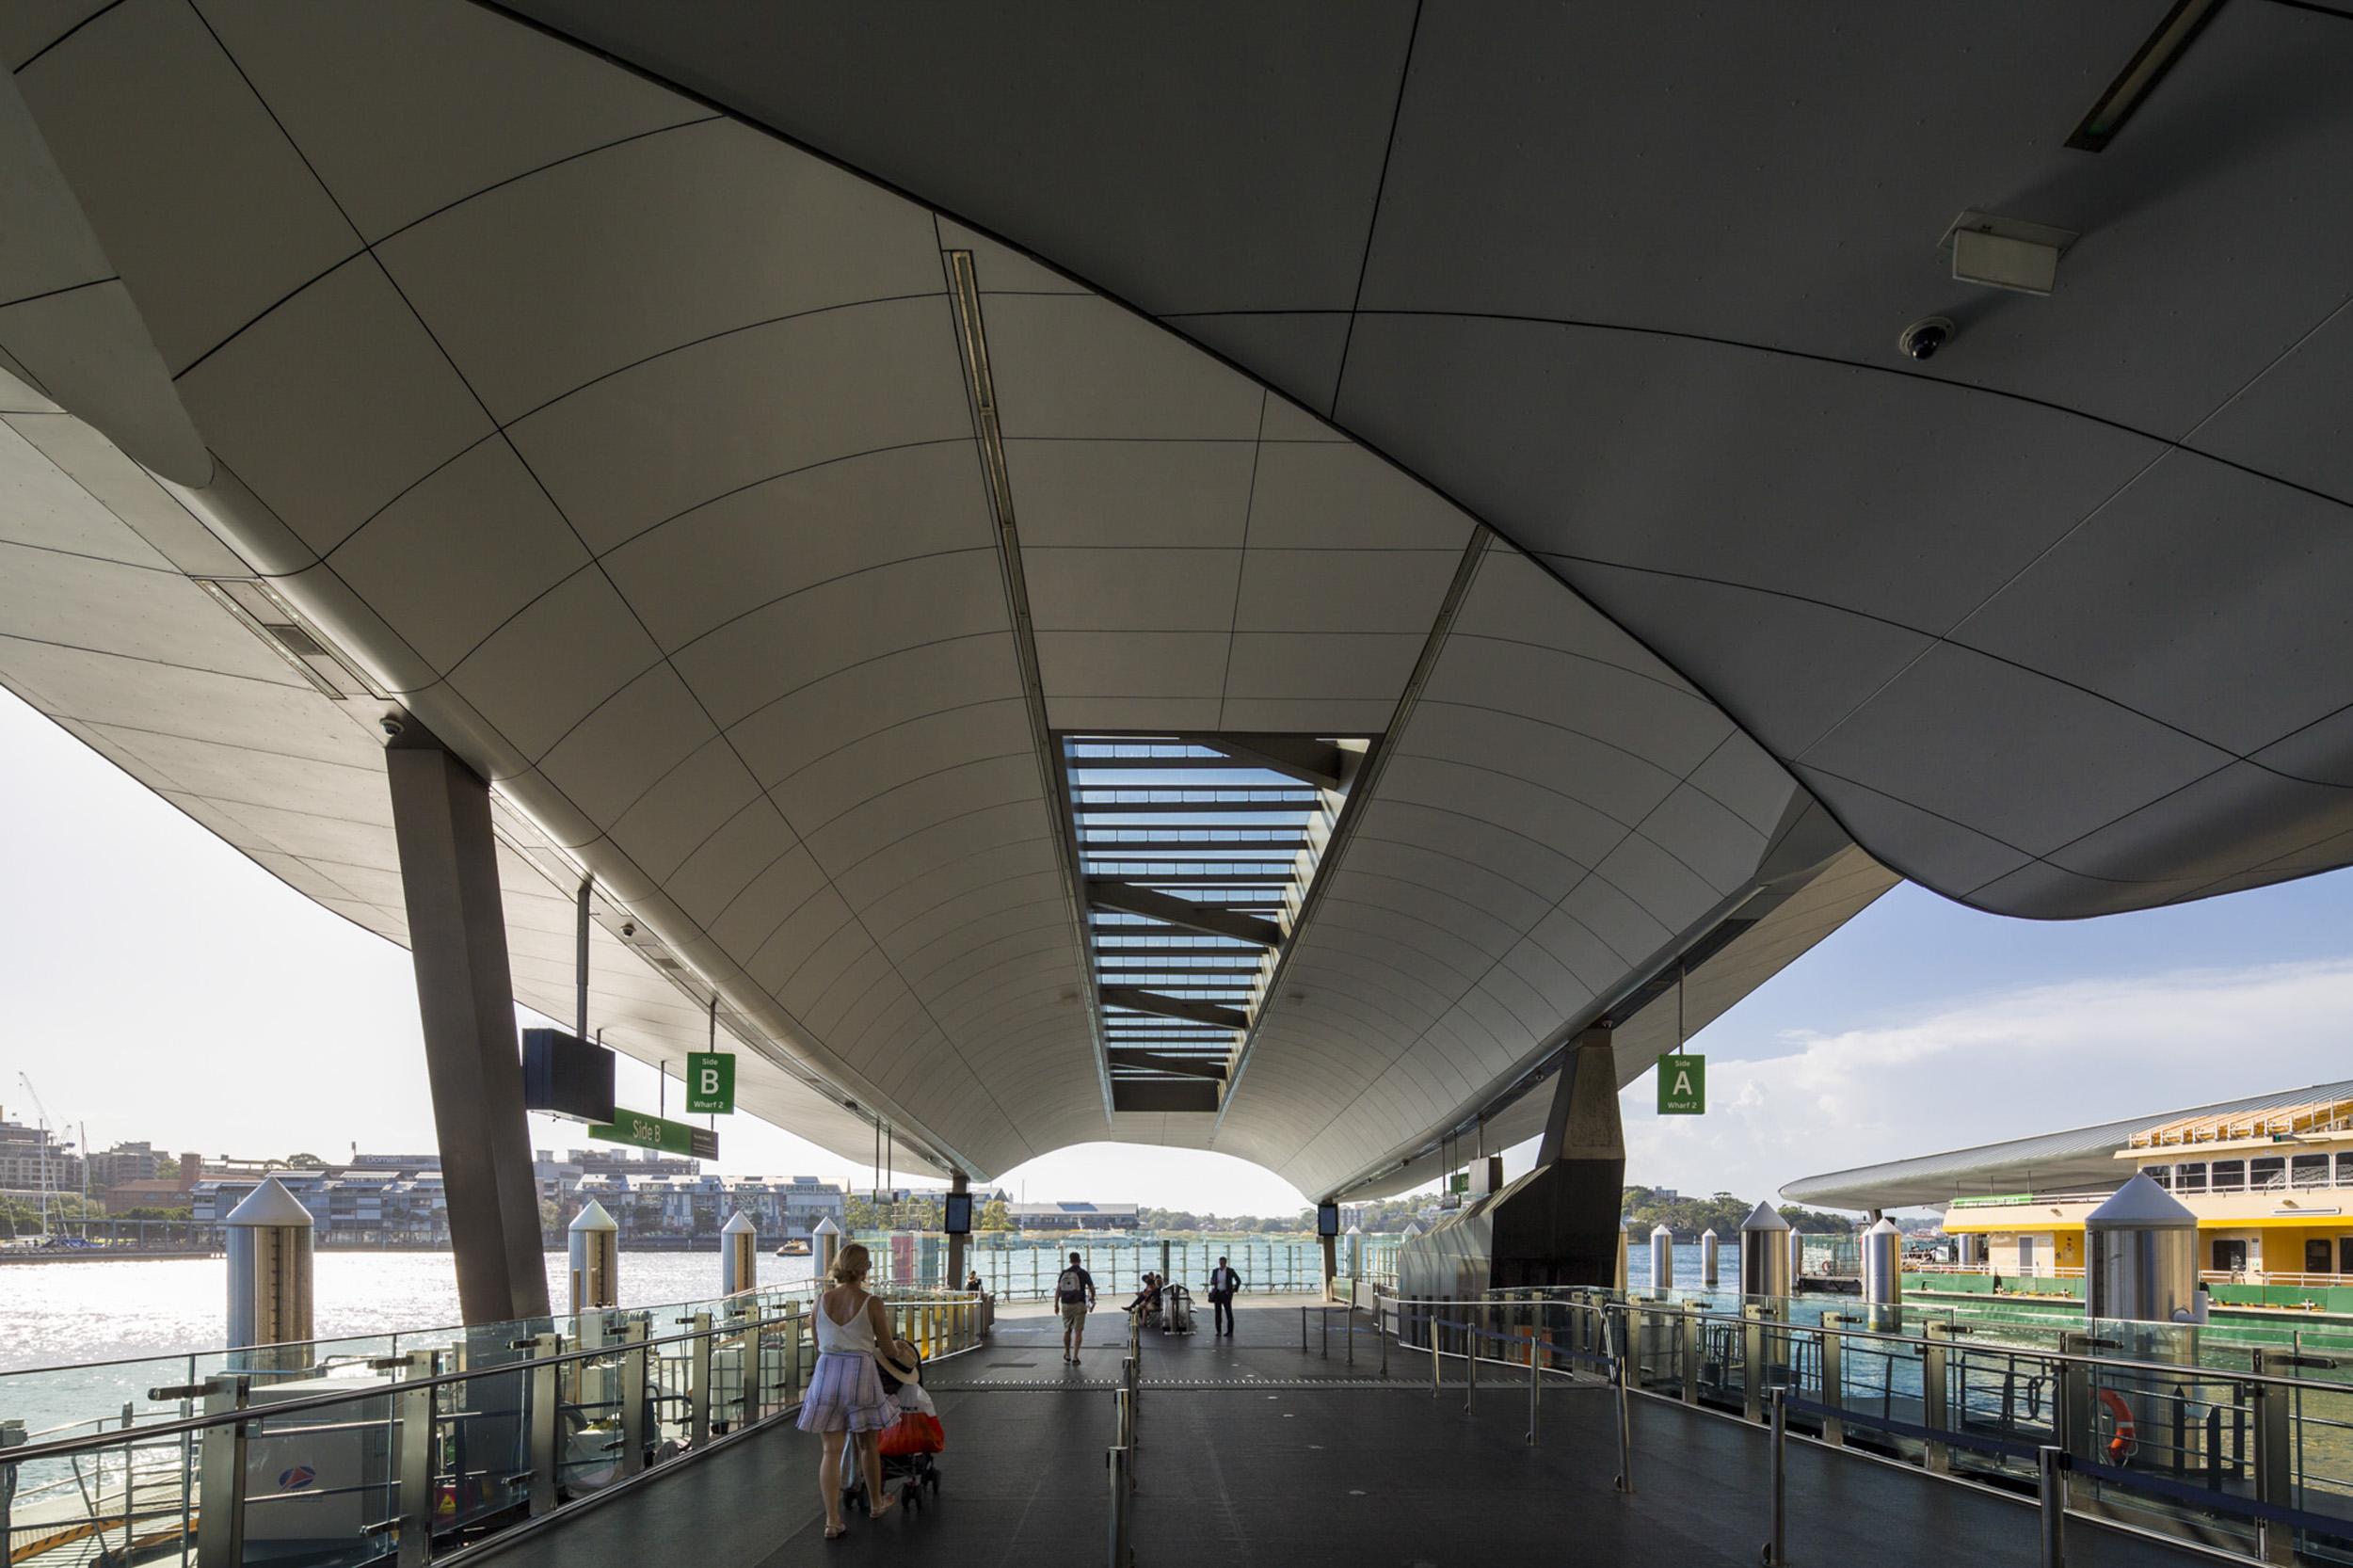 Barangaroo_wharf_cox_architecture_sydney_04.jpg